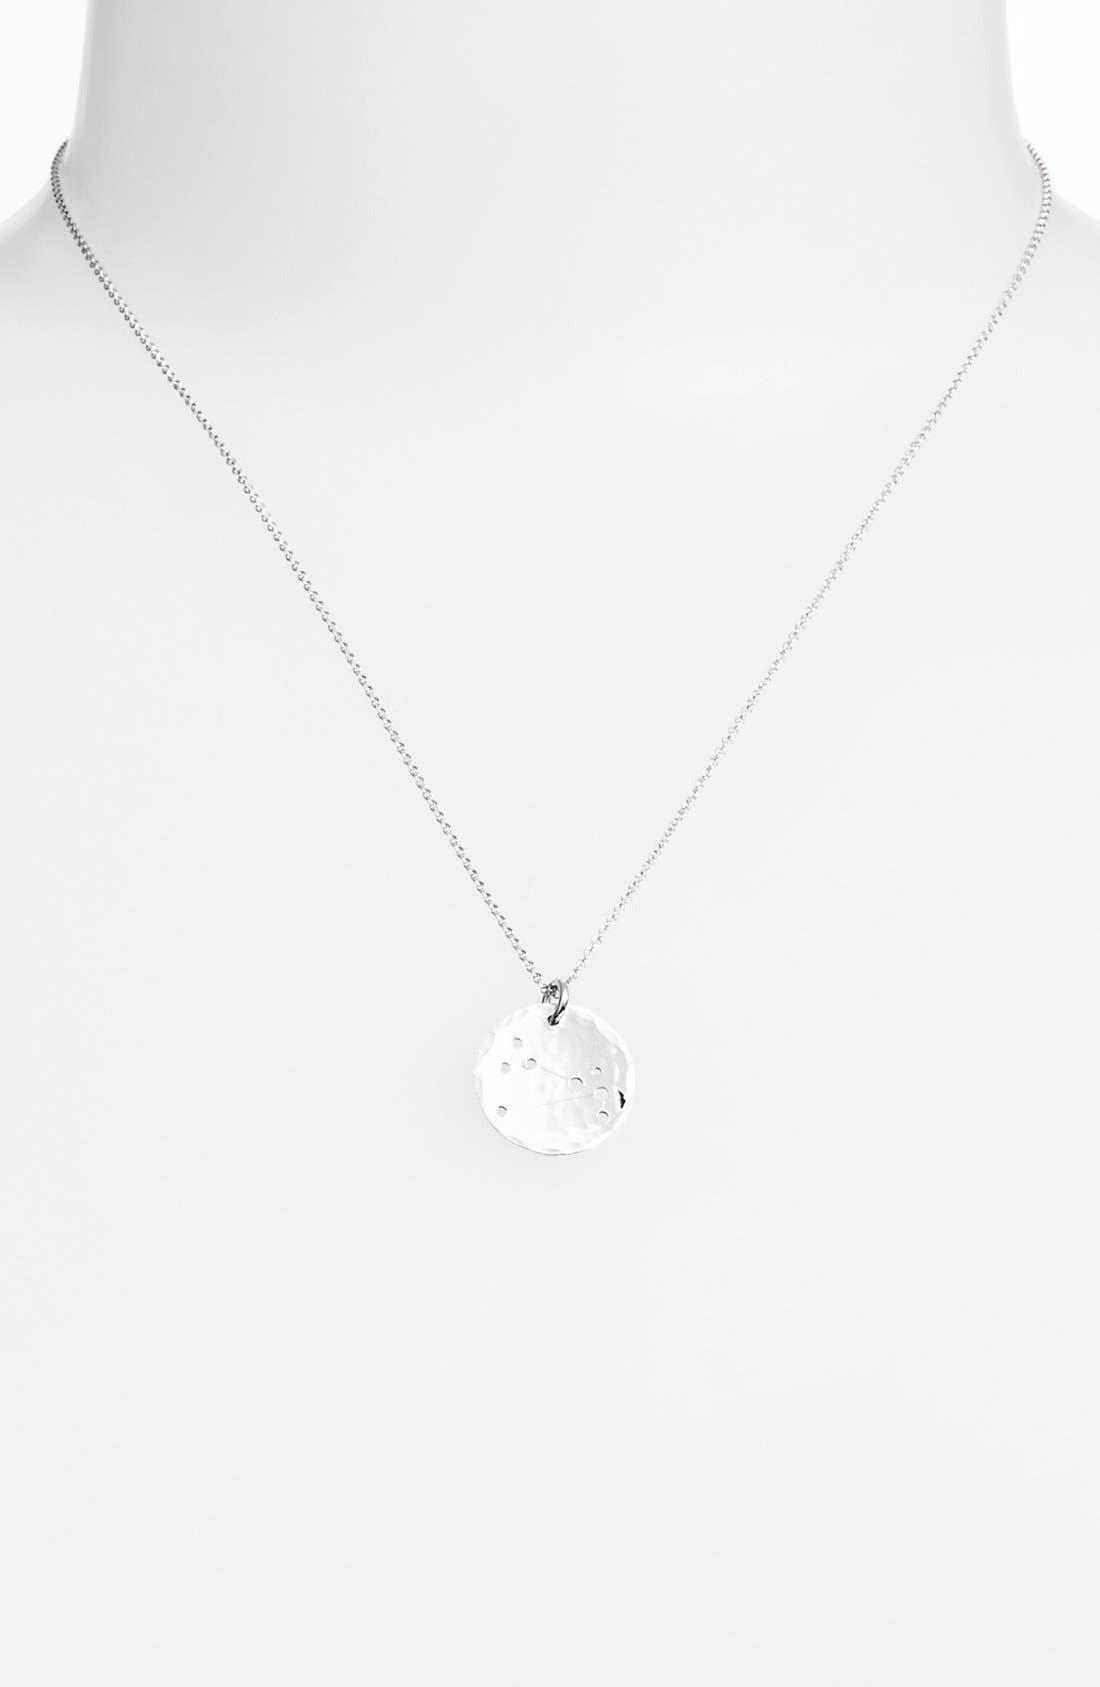 Ija 'Small Zodiac' Sterling Silver Necklace,                             Main thumbnail 1, color,